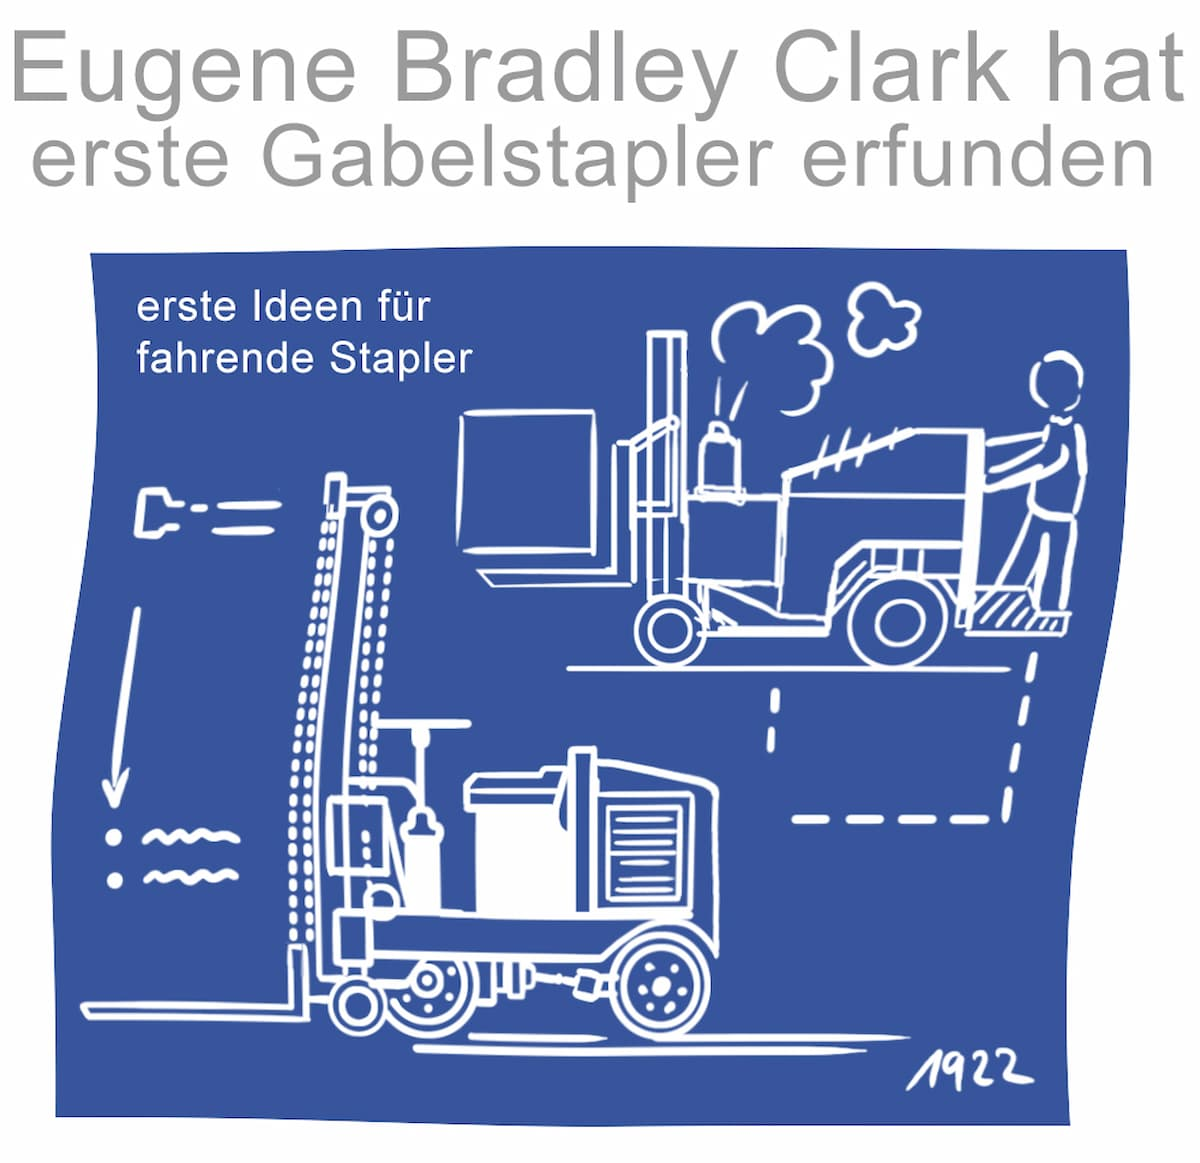 Eugen Bradley Clark gilt als Erfinder des Gabelstaplers